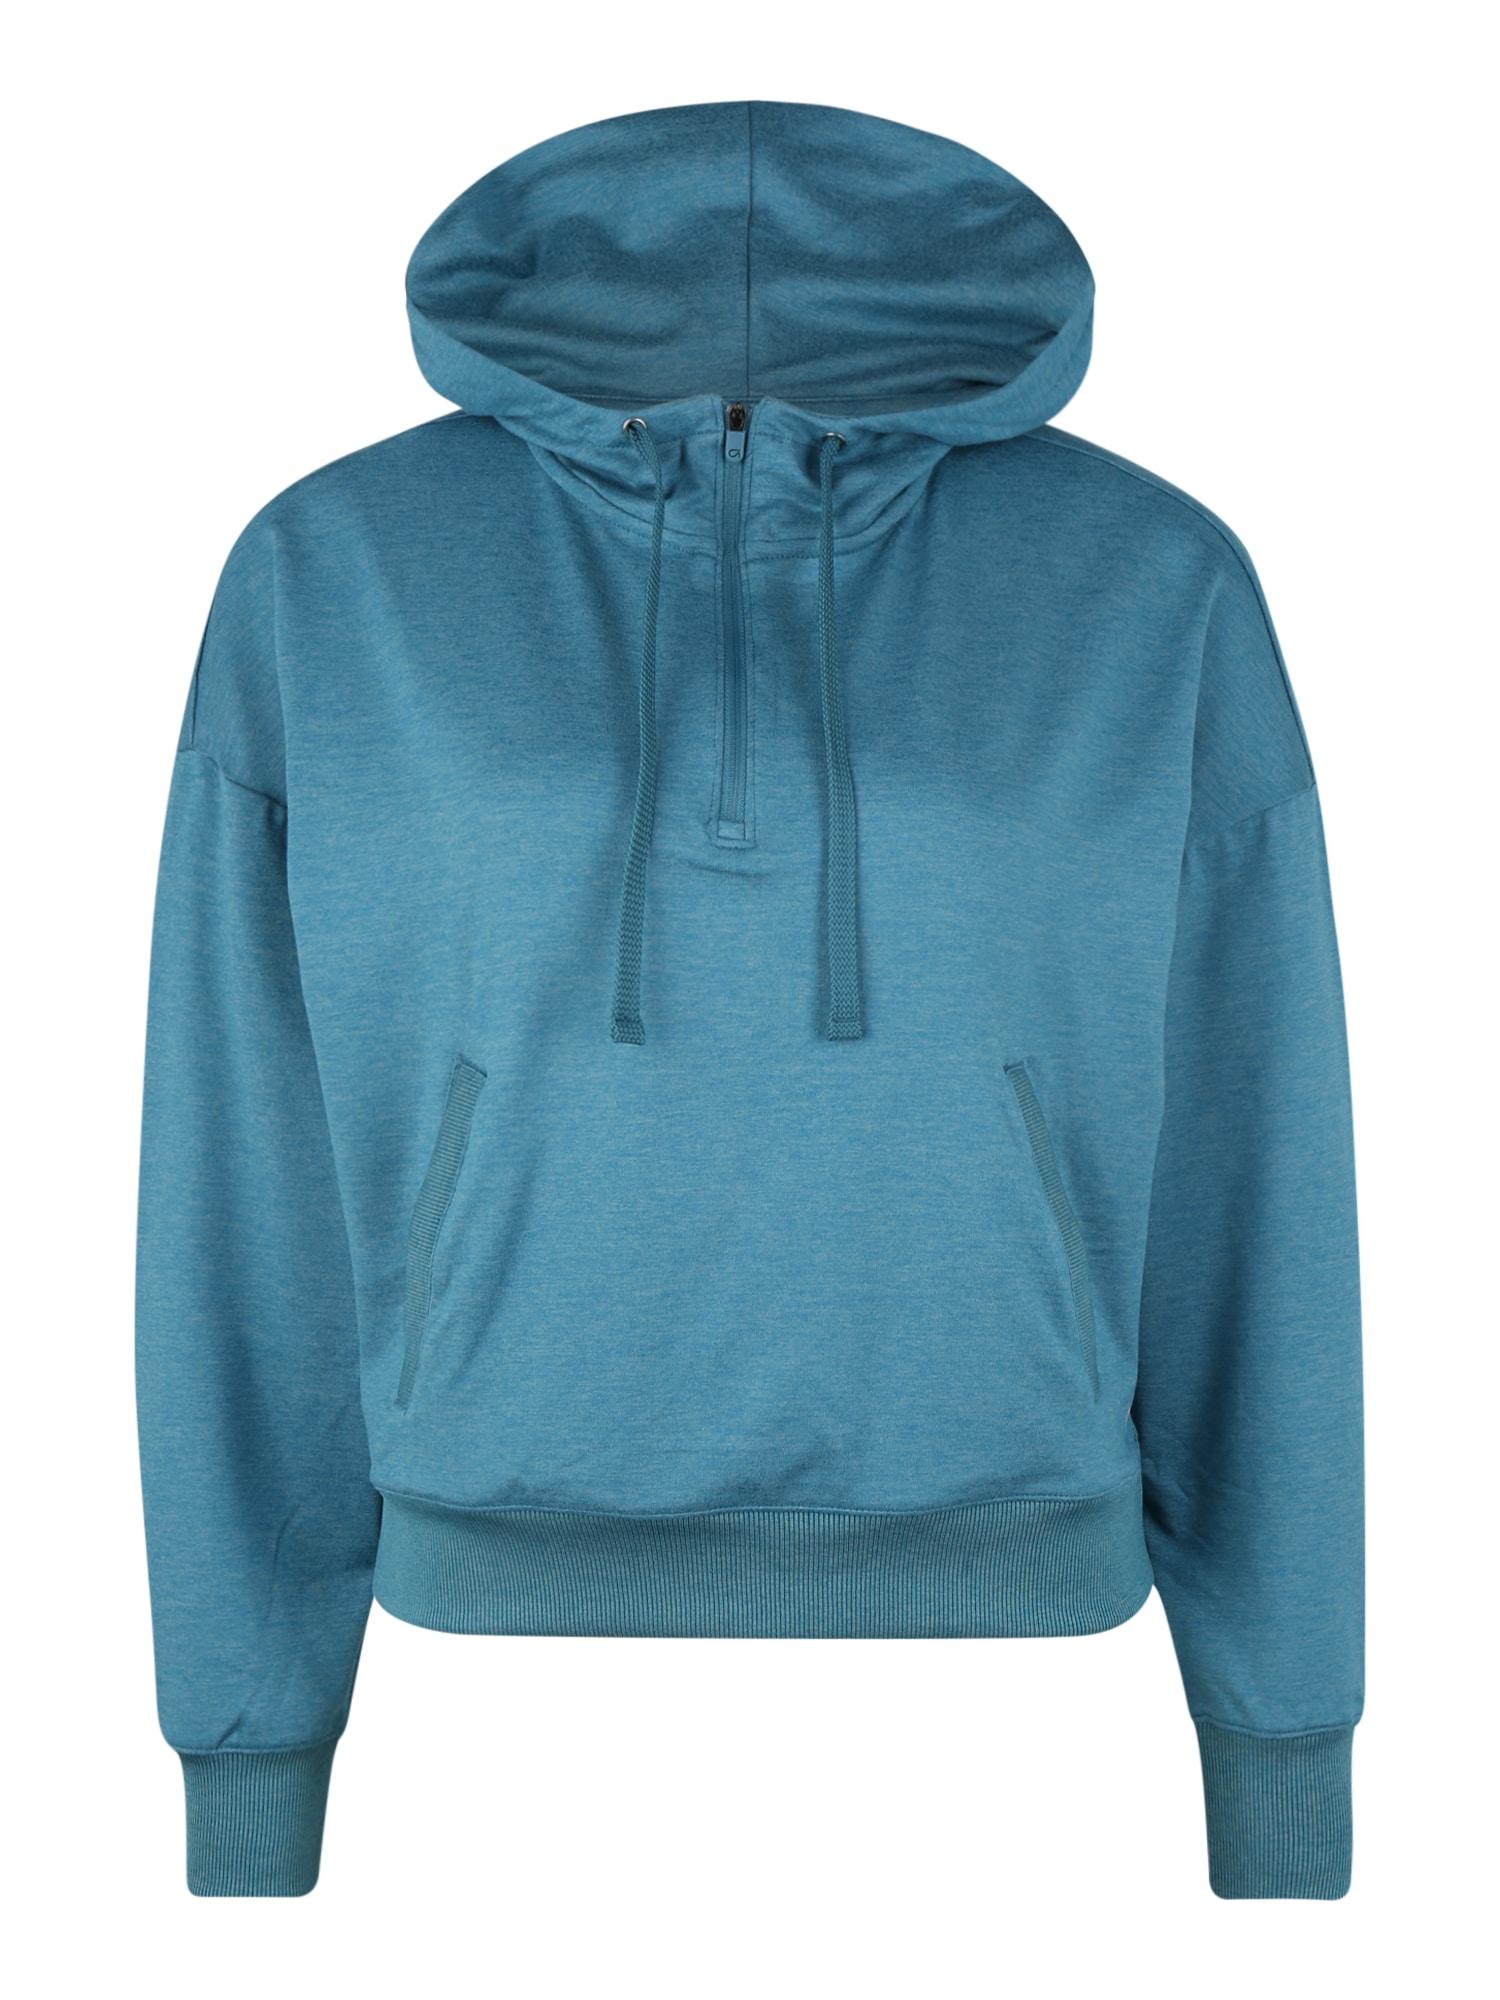 GAP Sportinio tipo megztinis 'BRUSHED JERSEY' mėlyna